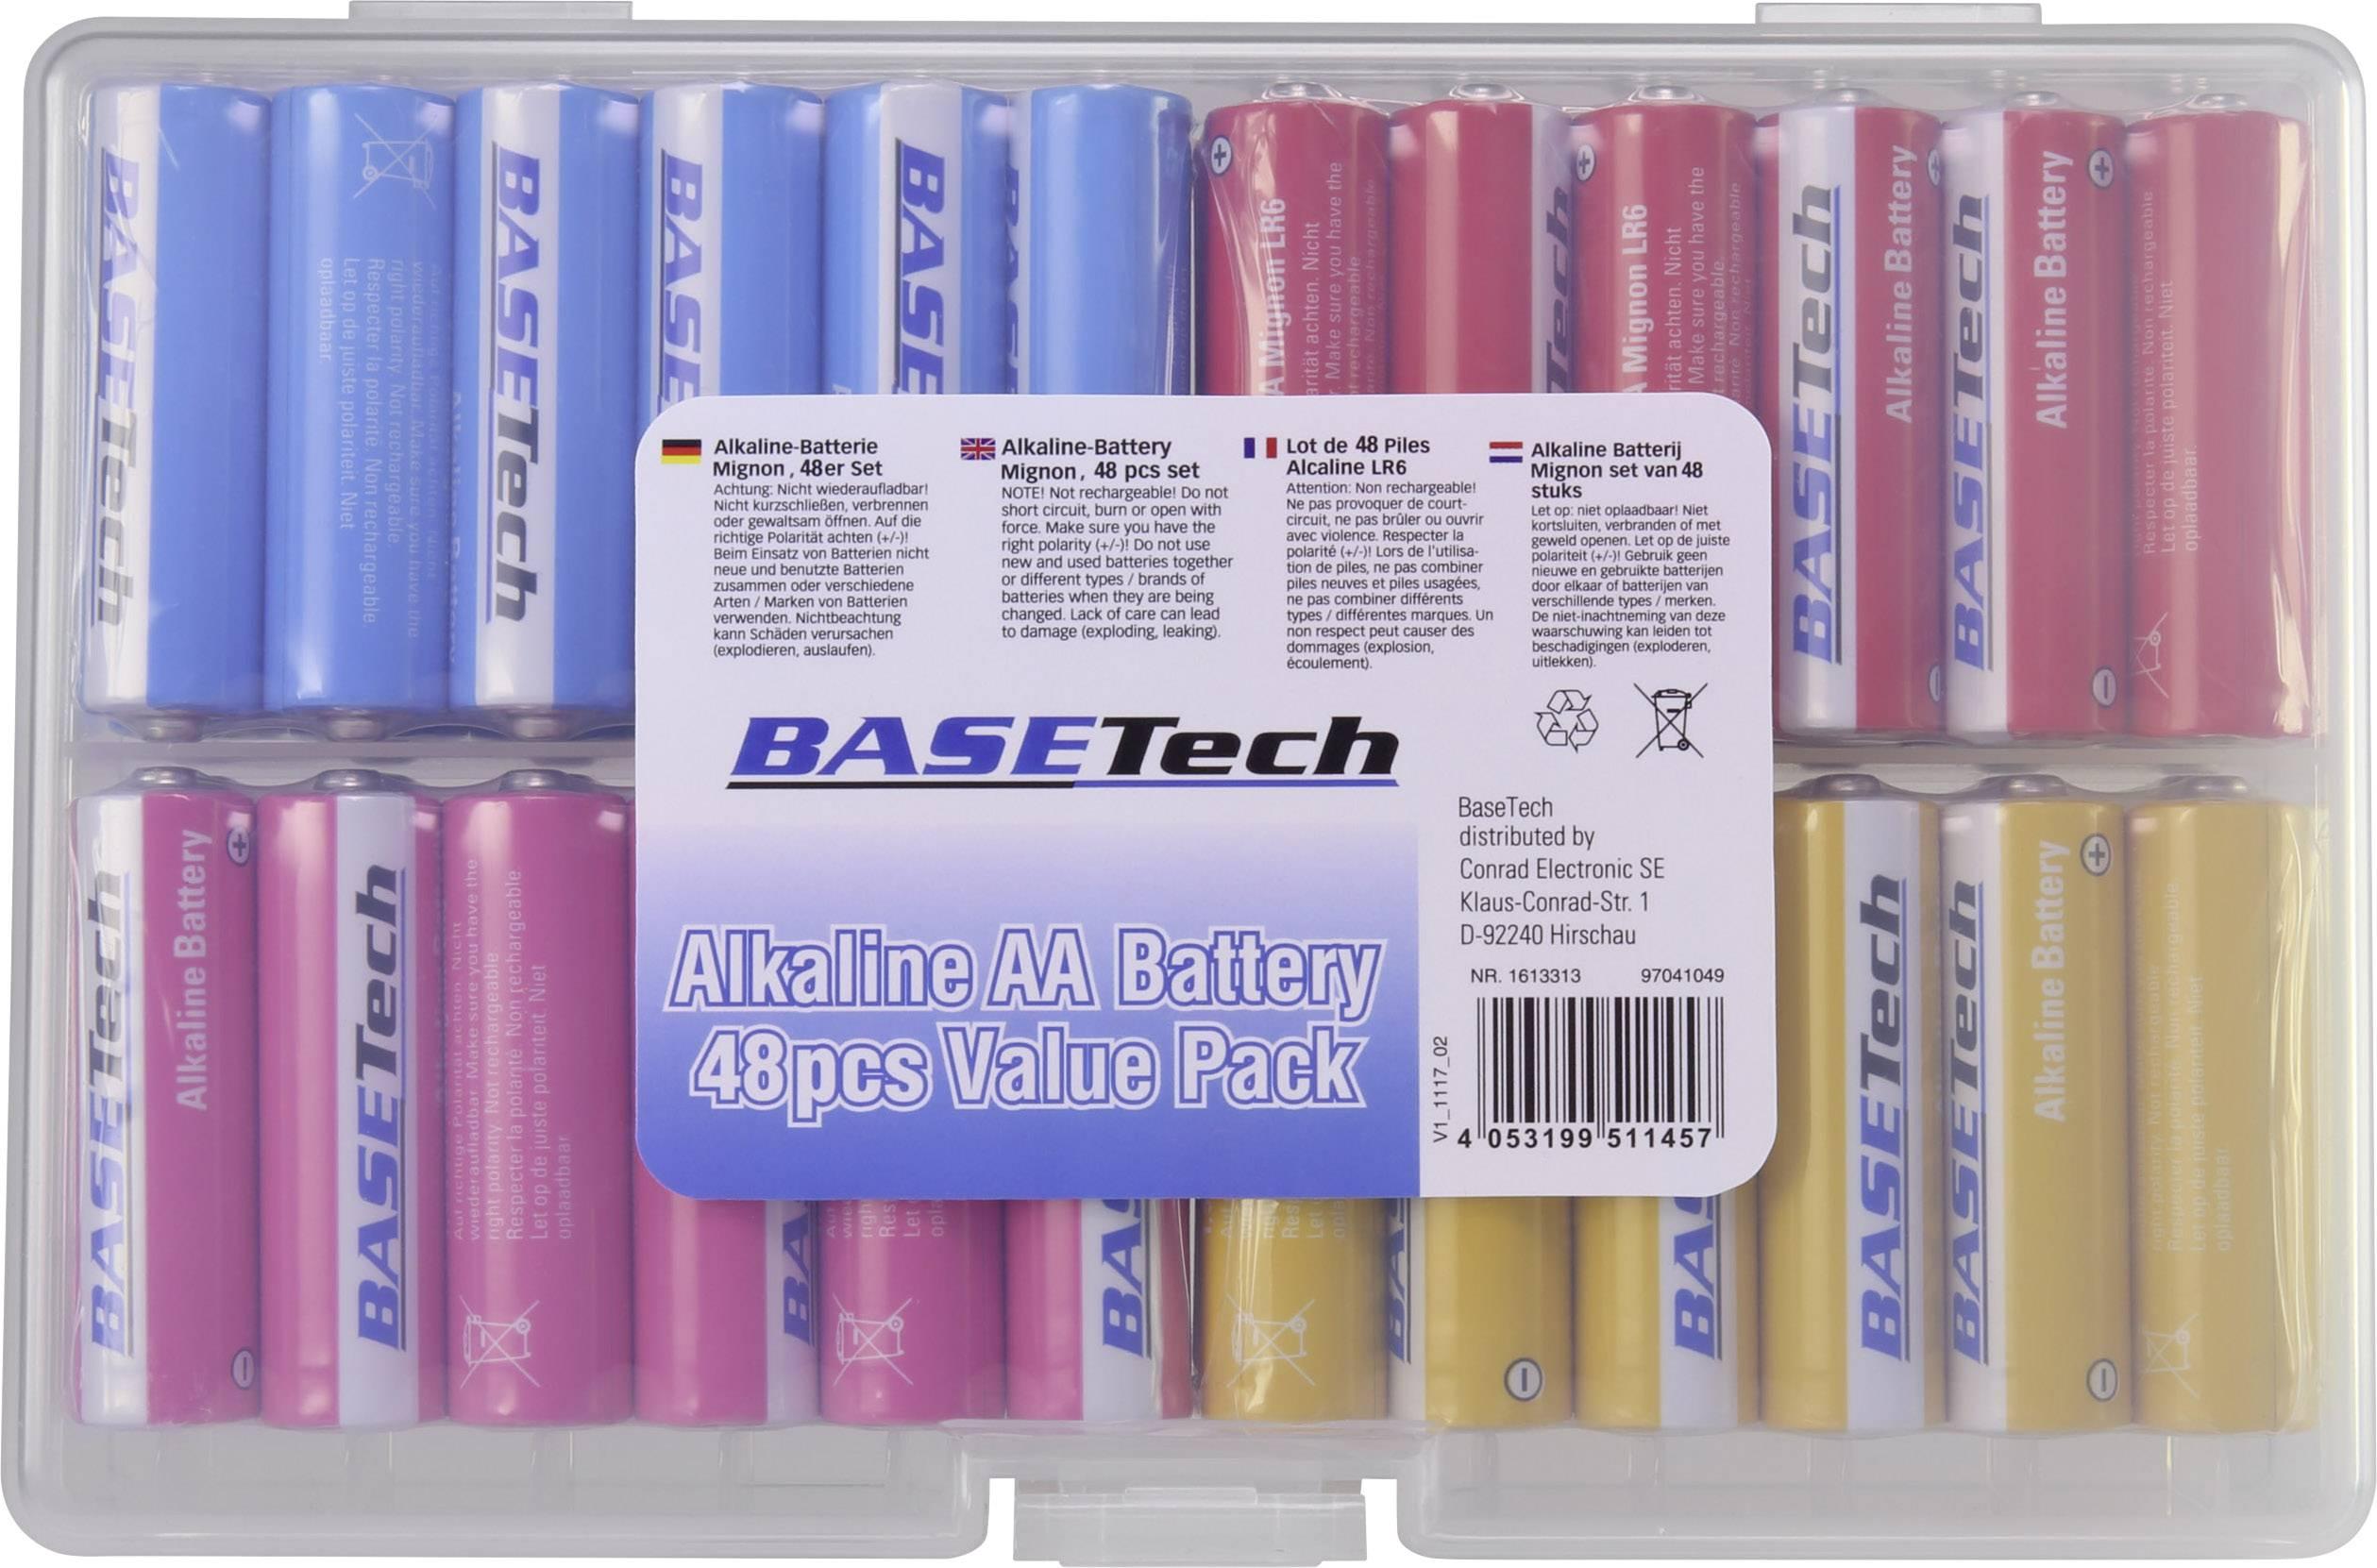 s AA 2650 mAh 1.5 V 48 pc Basetech 1613313 alcaline Pile LR6 s